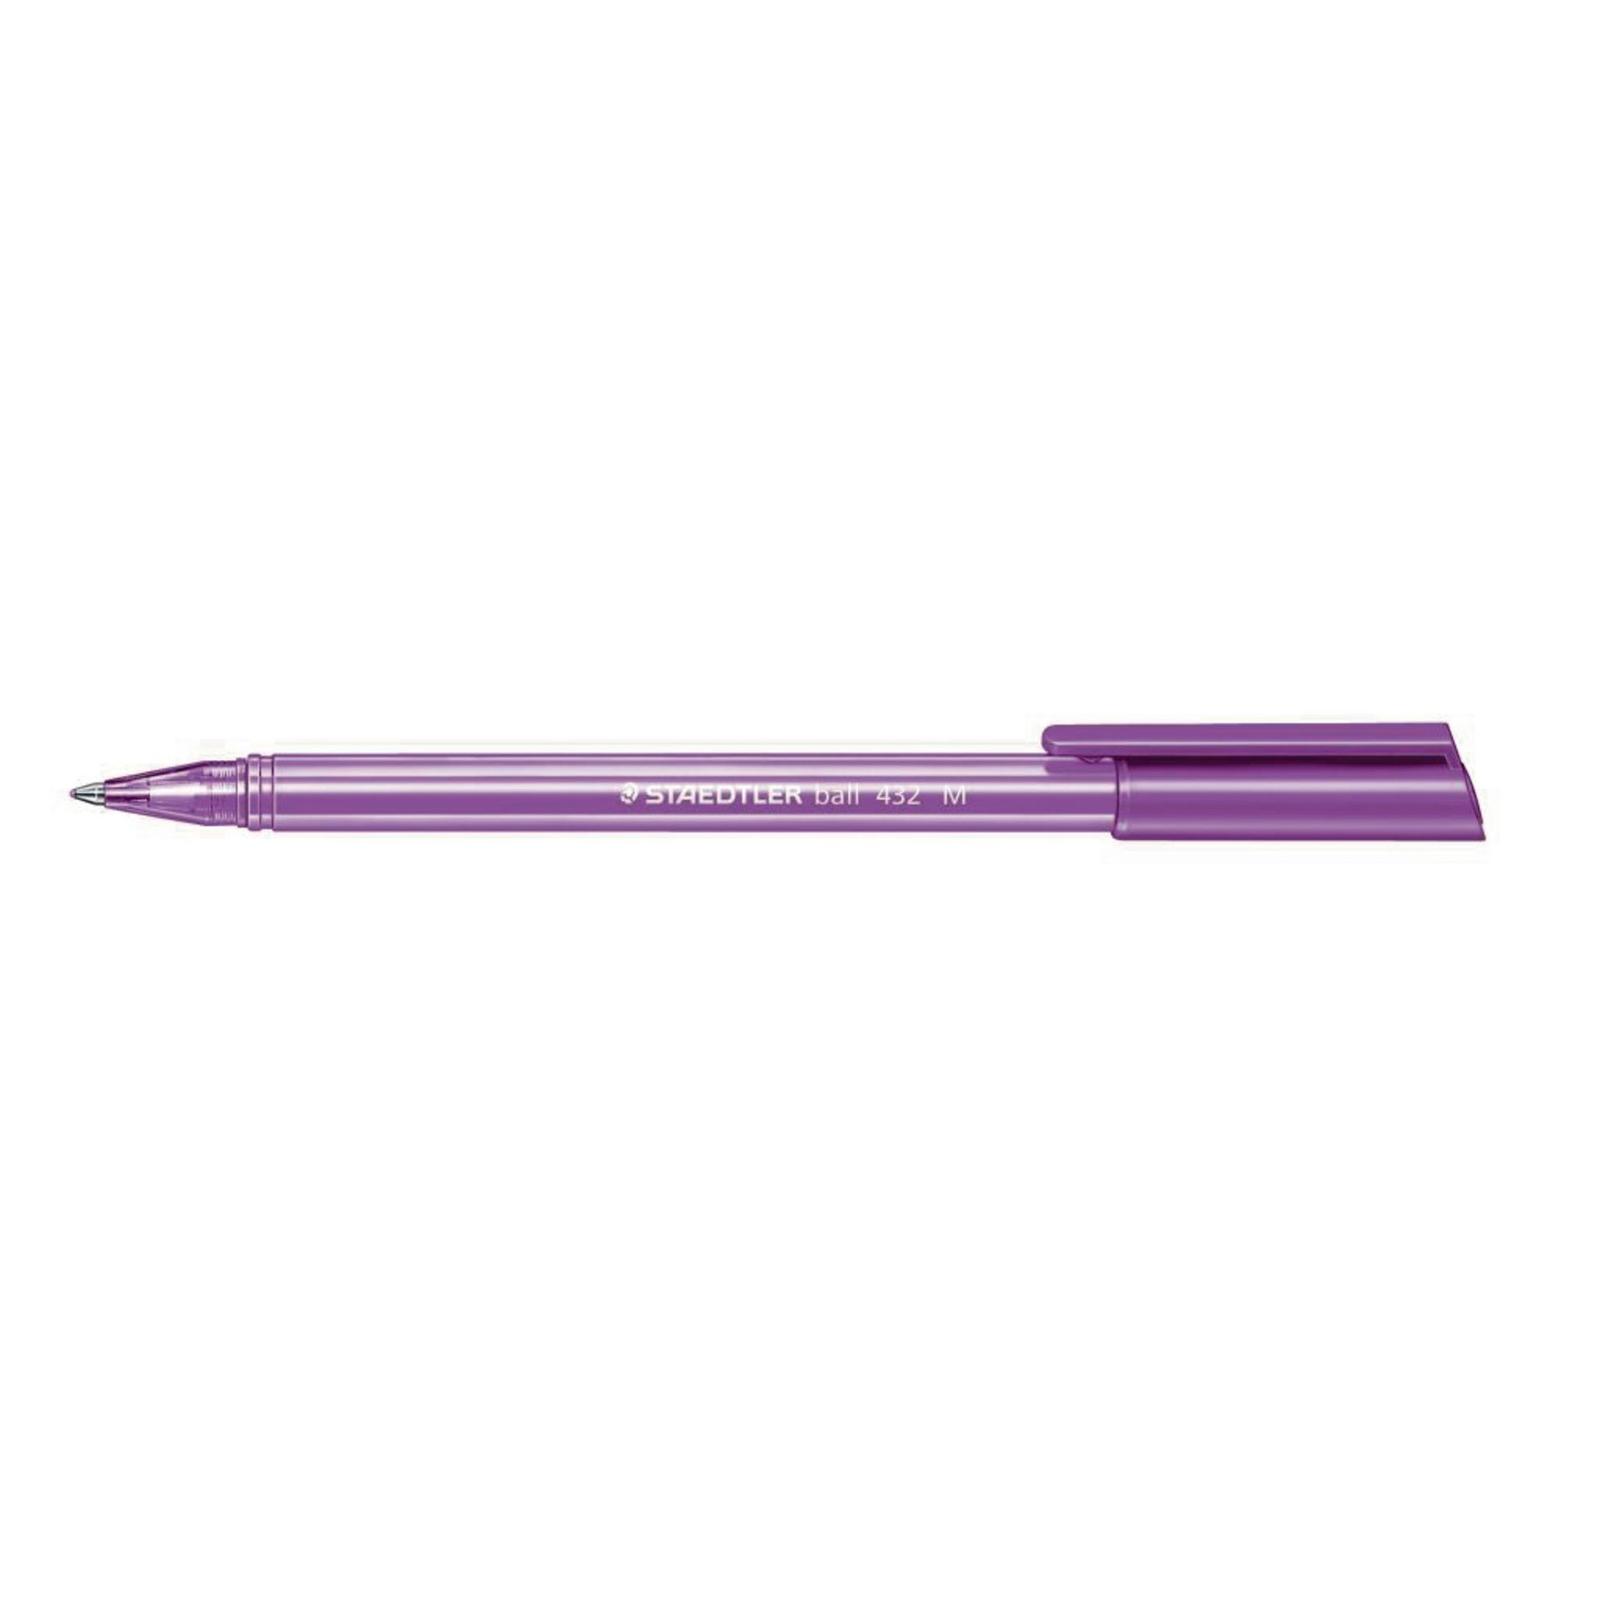 Staedtler Ball 432 Ballpoint Pen Assorted - Pack of 10